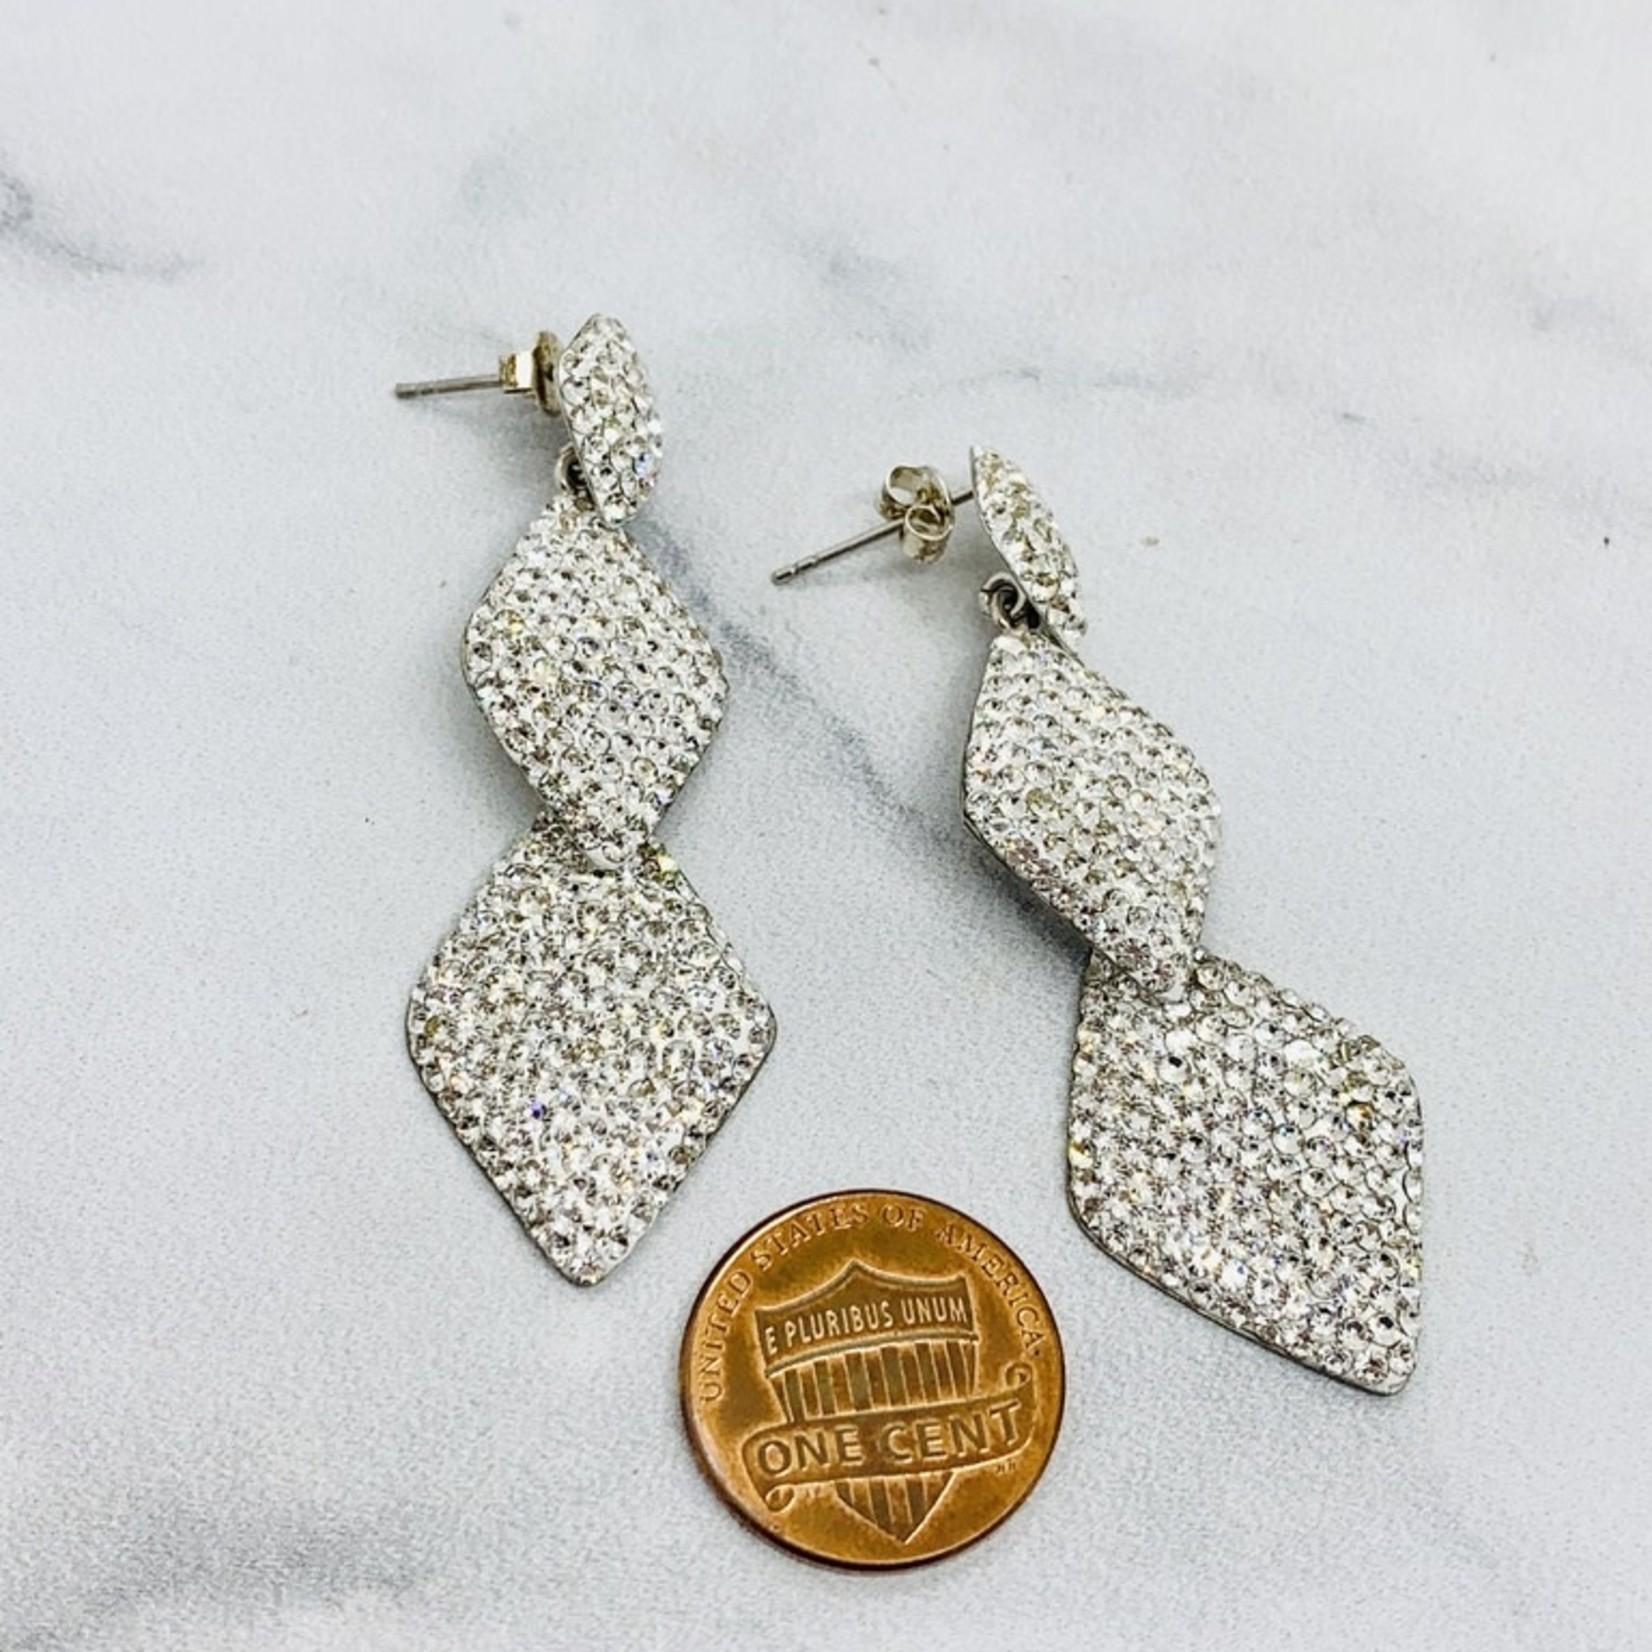 Native Gems MARVEL ilume earrings, silver